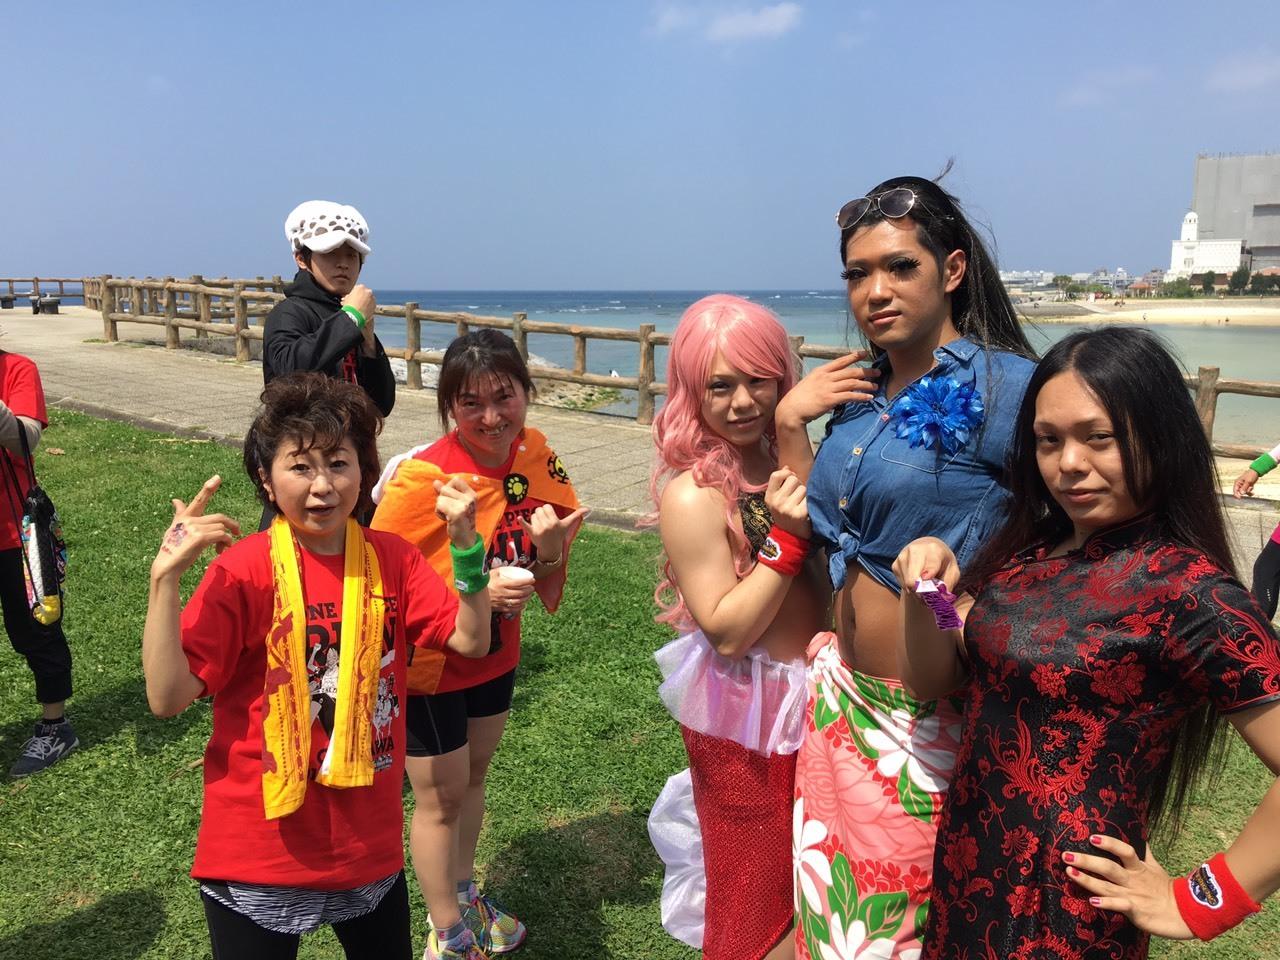 ONE PIECE RUN in 沖縄2016_a0163623_21123482.jpg